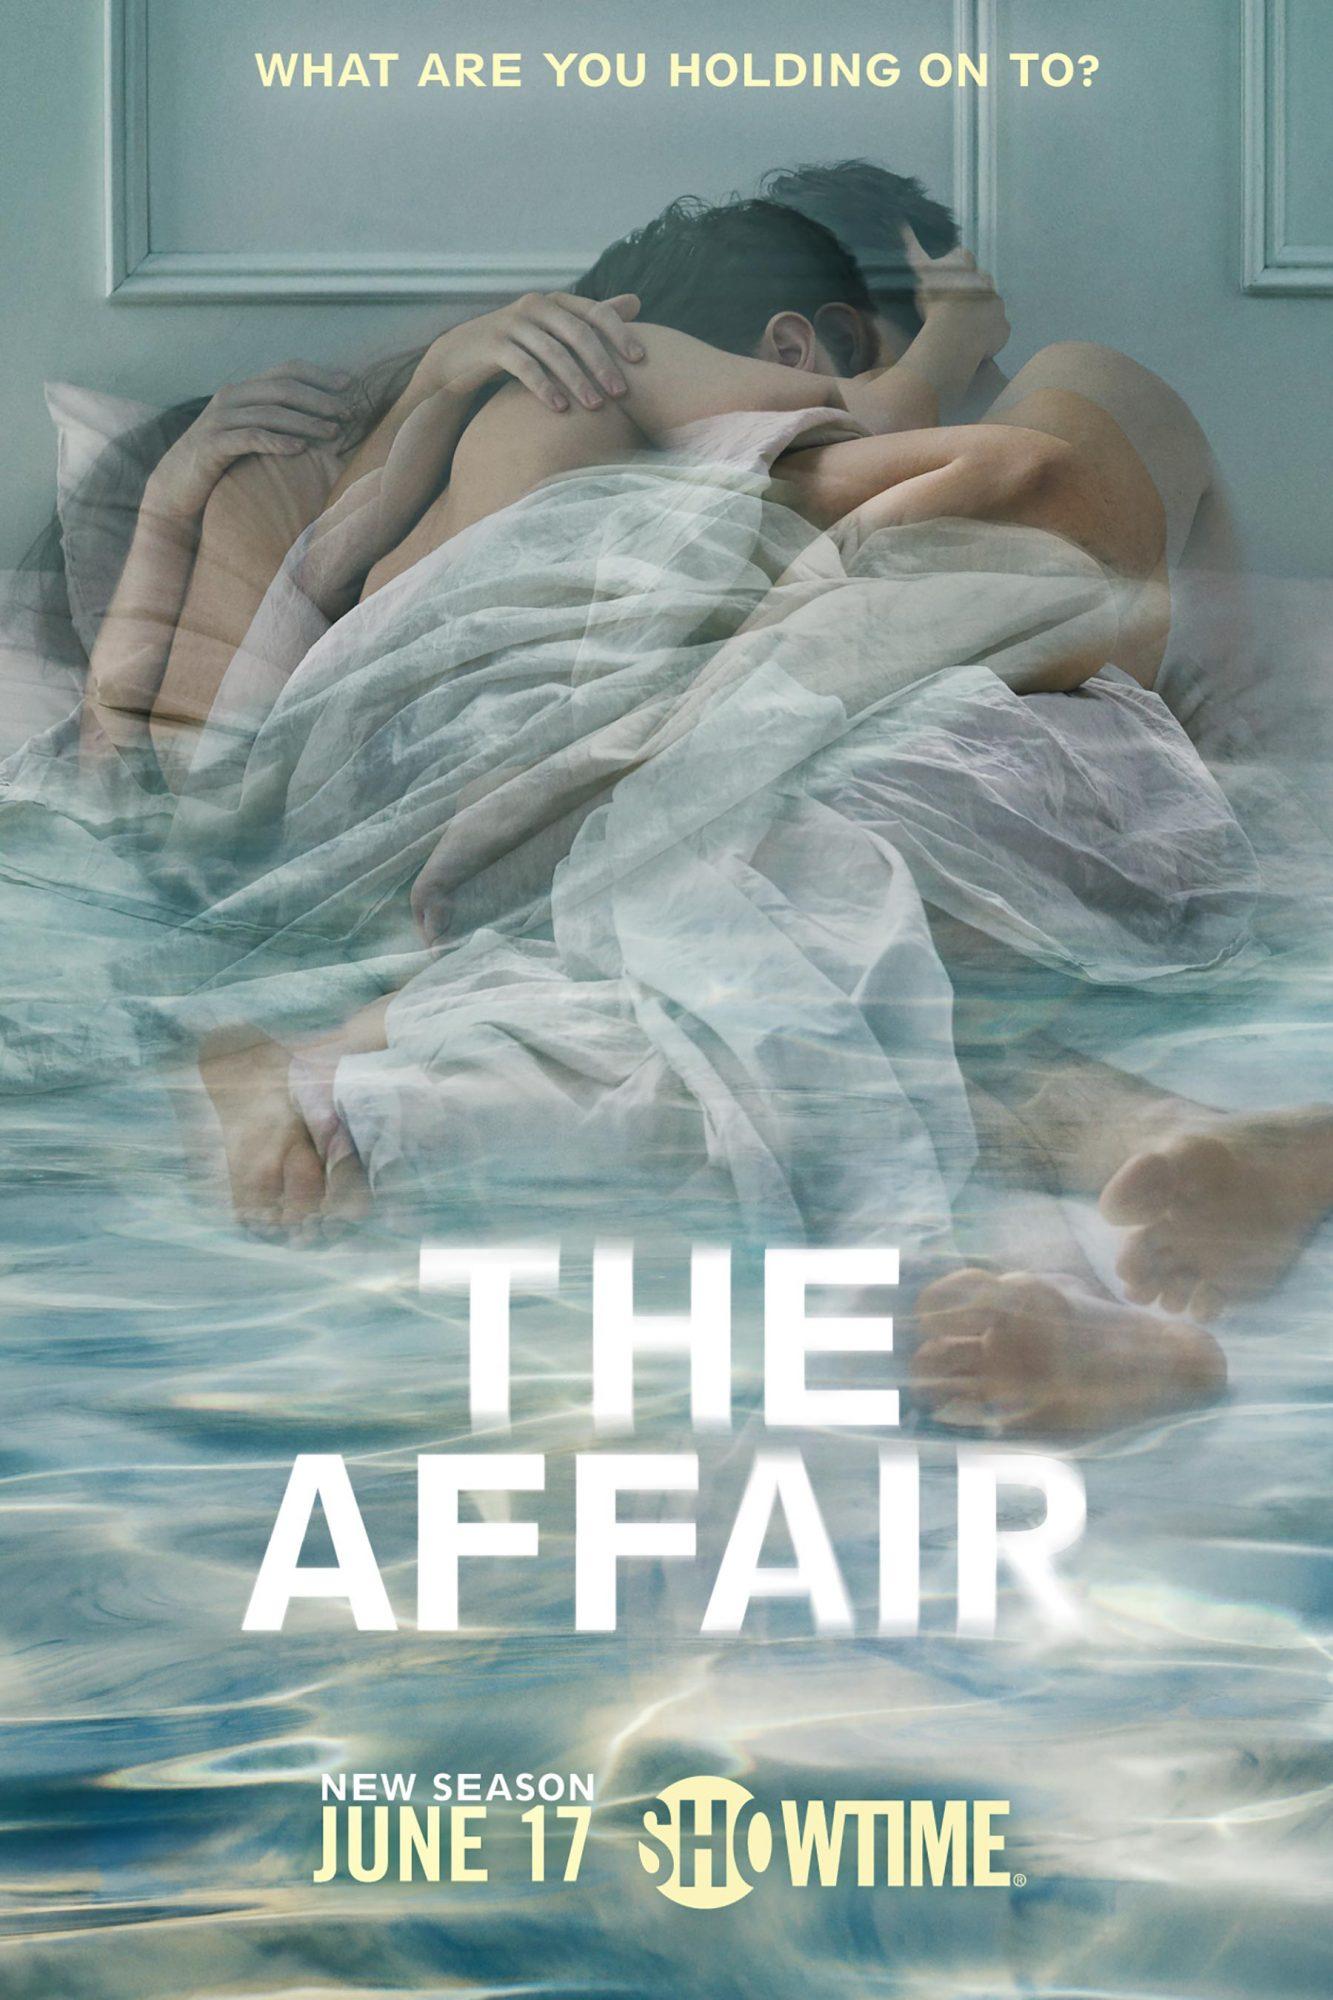 The Affair Key Art CR: Showtime